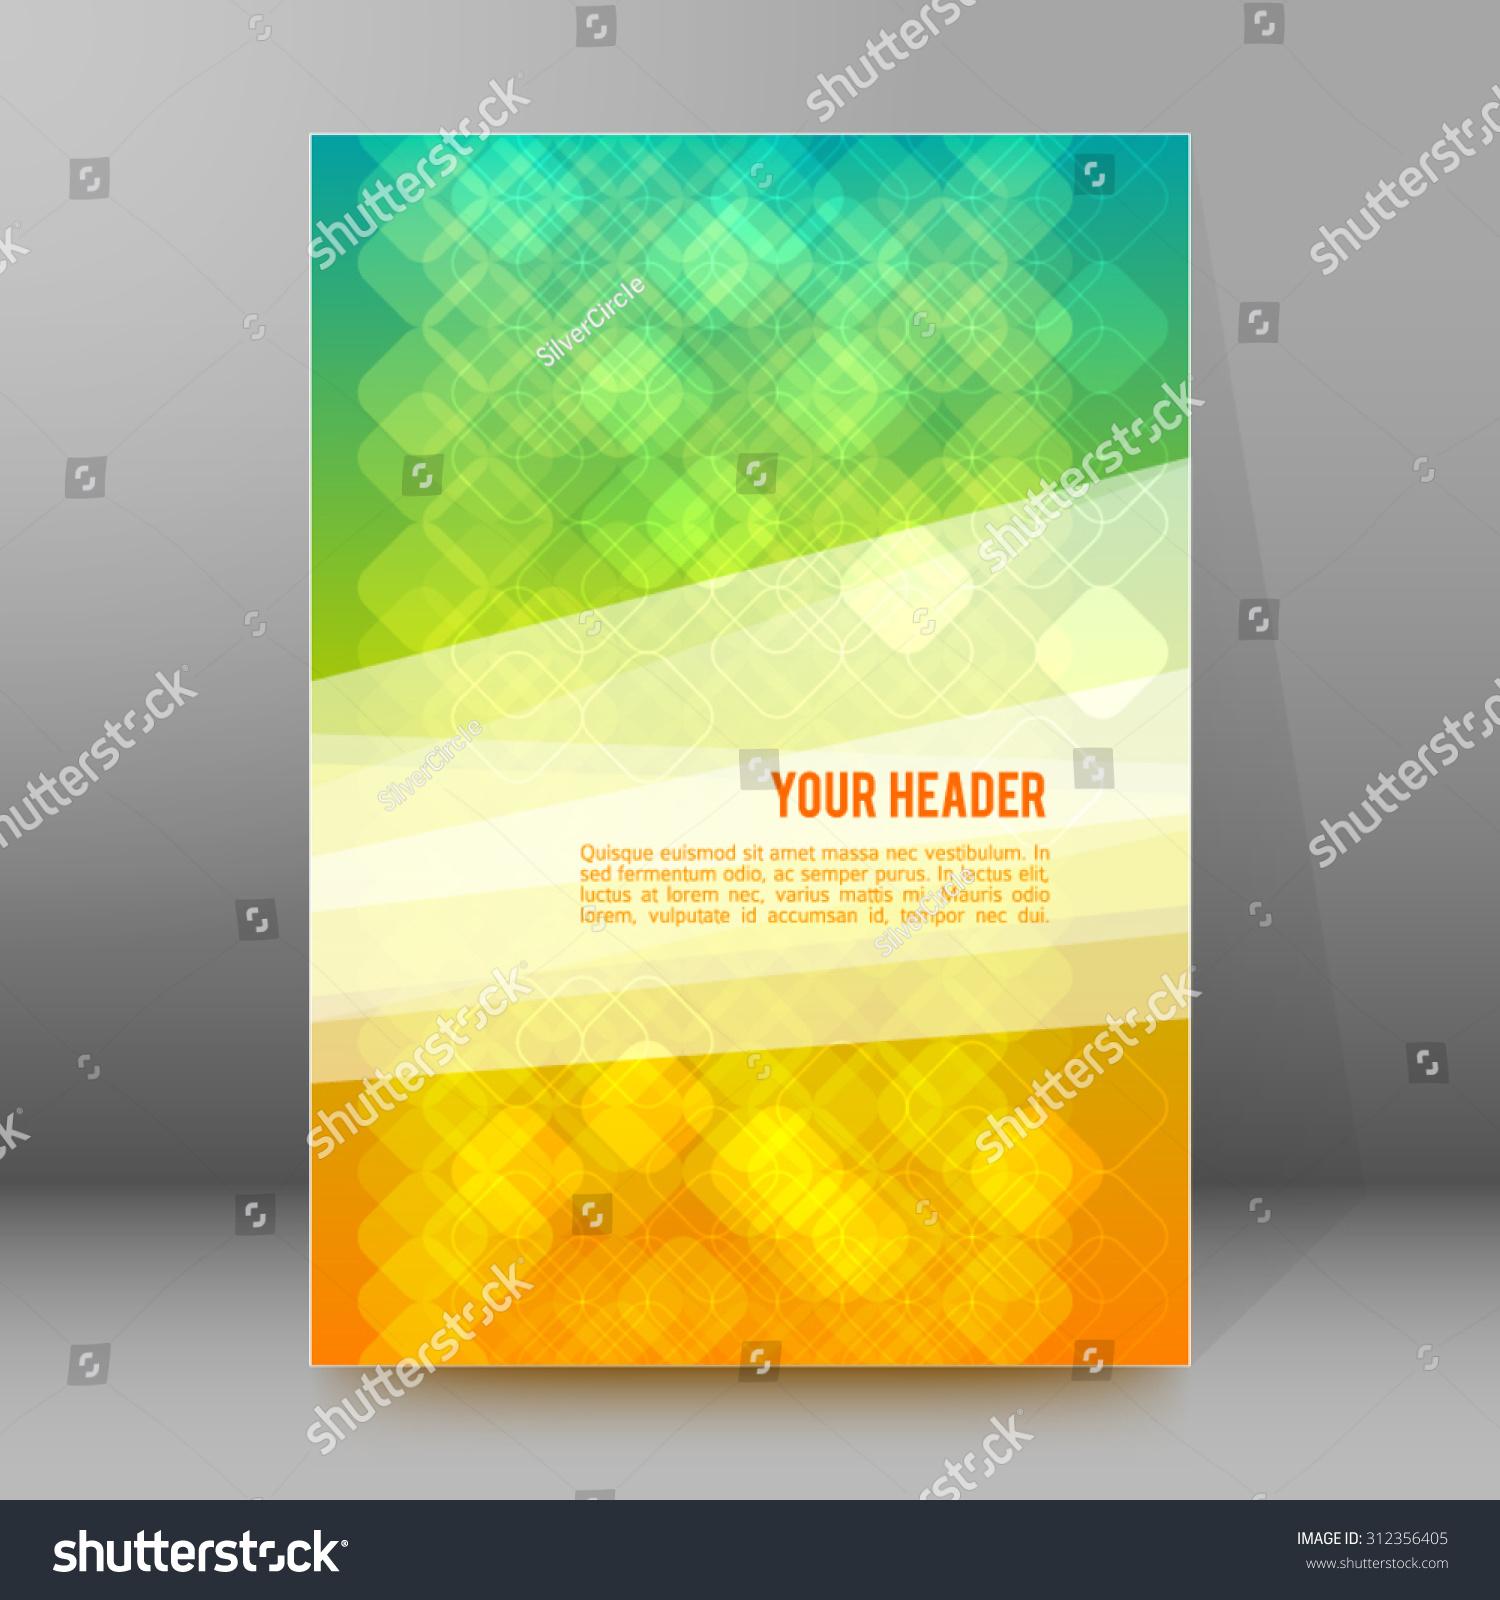 advertisement flyer design elements mesh yellow stock vector advertisement flyer design elements mesh yellow green gradient background elegant graphic mosaic bright light